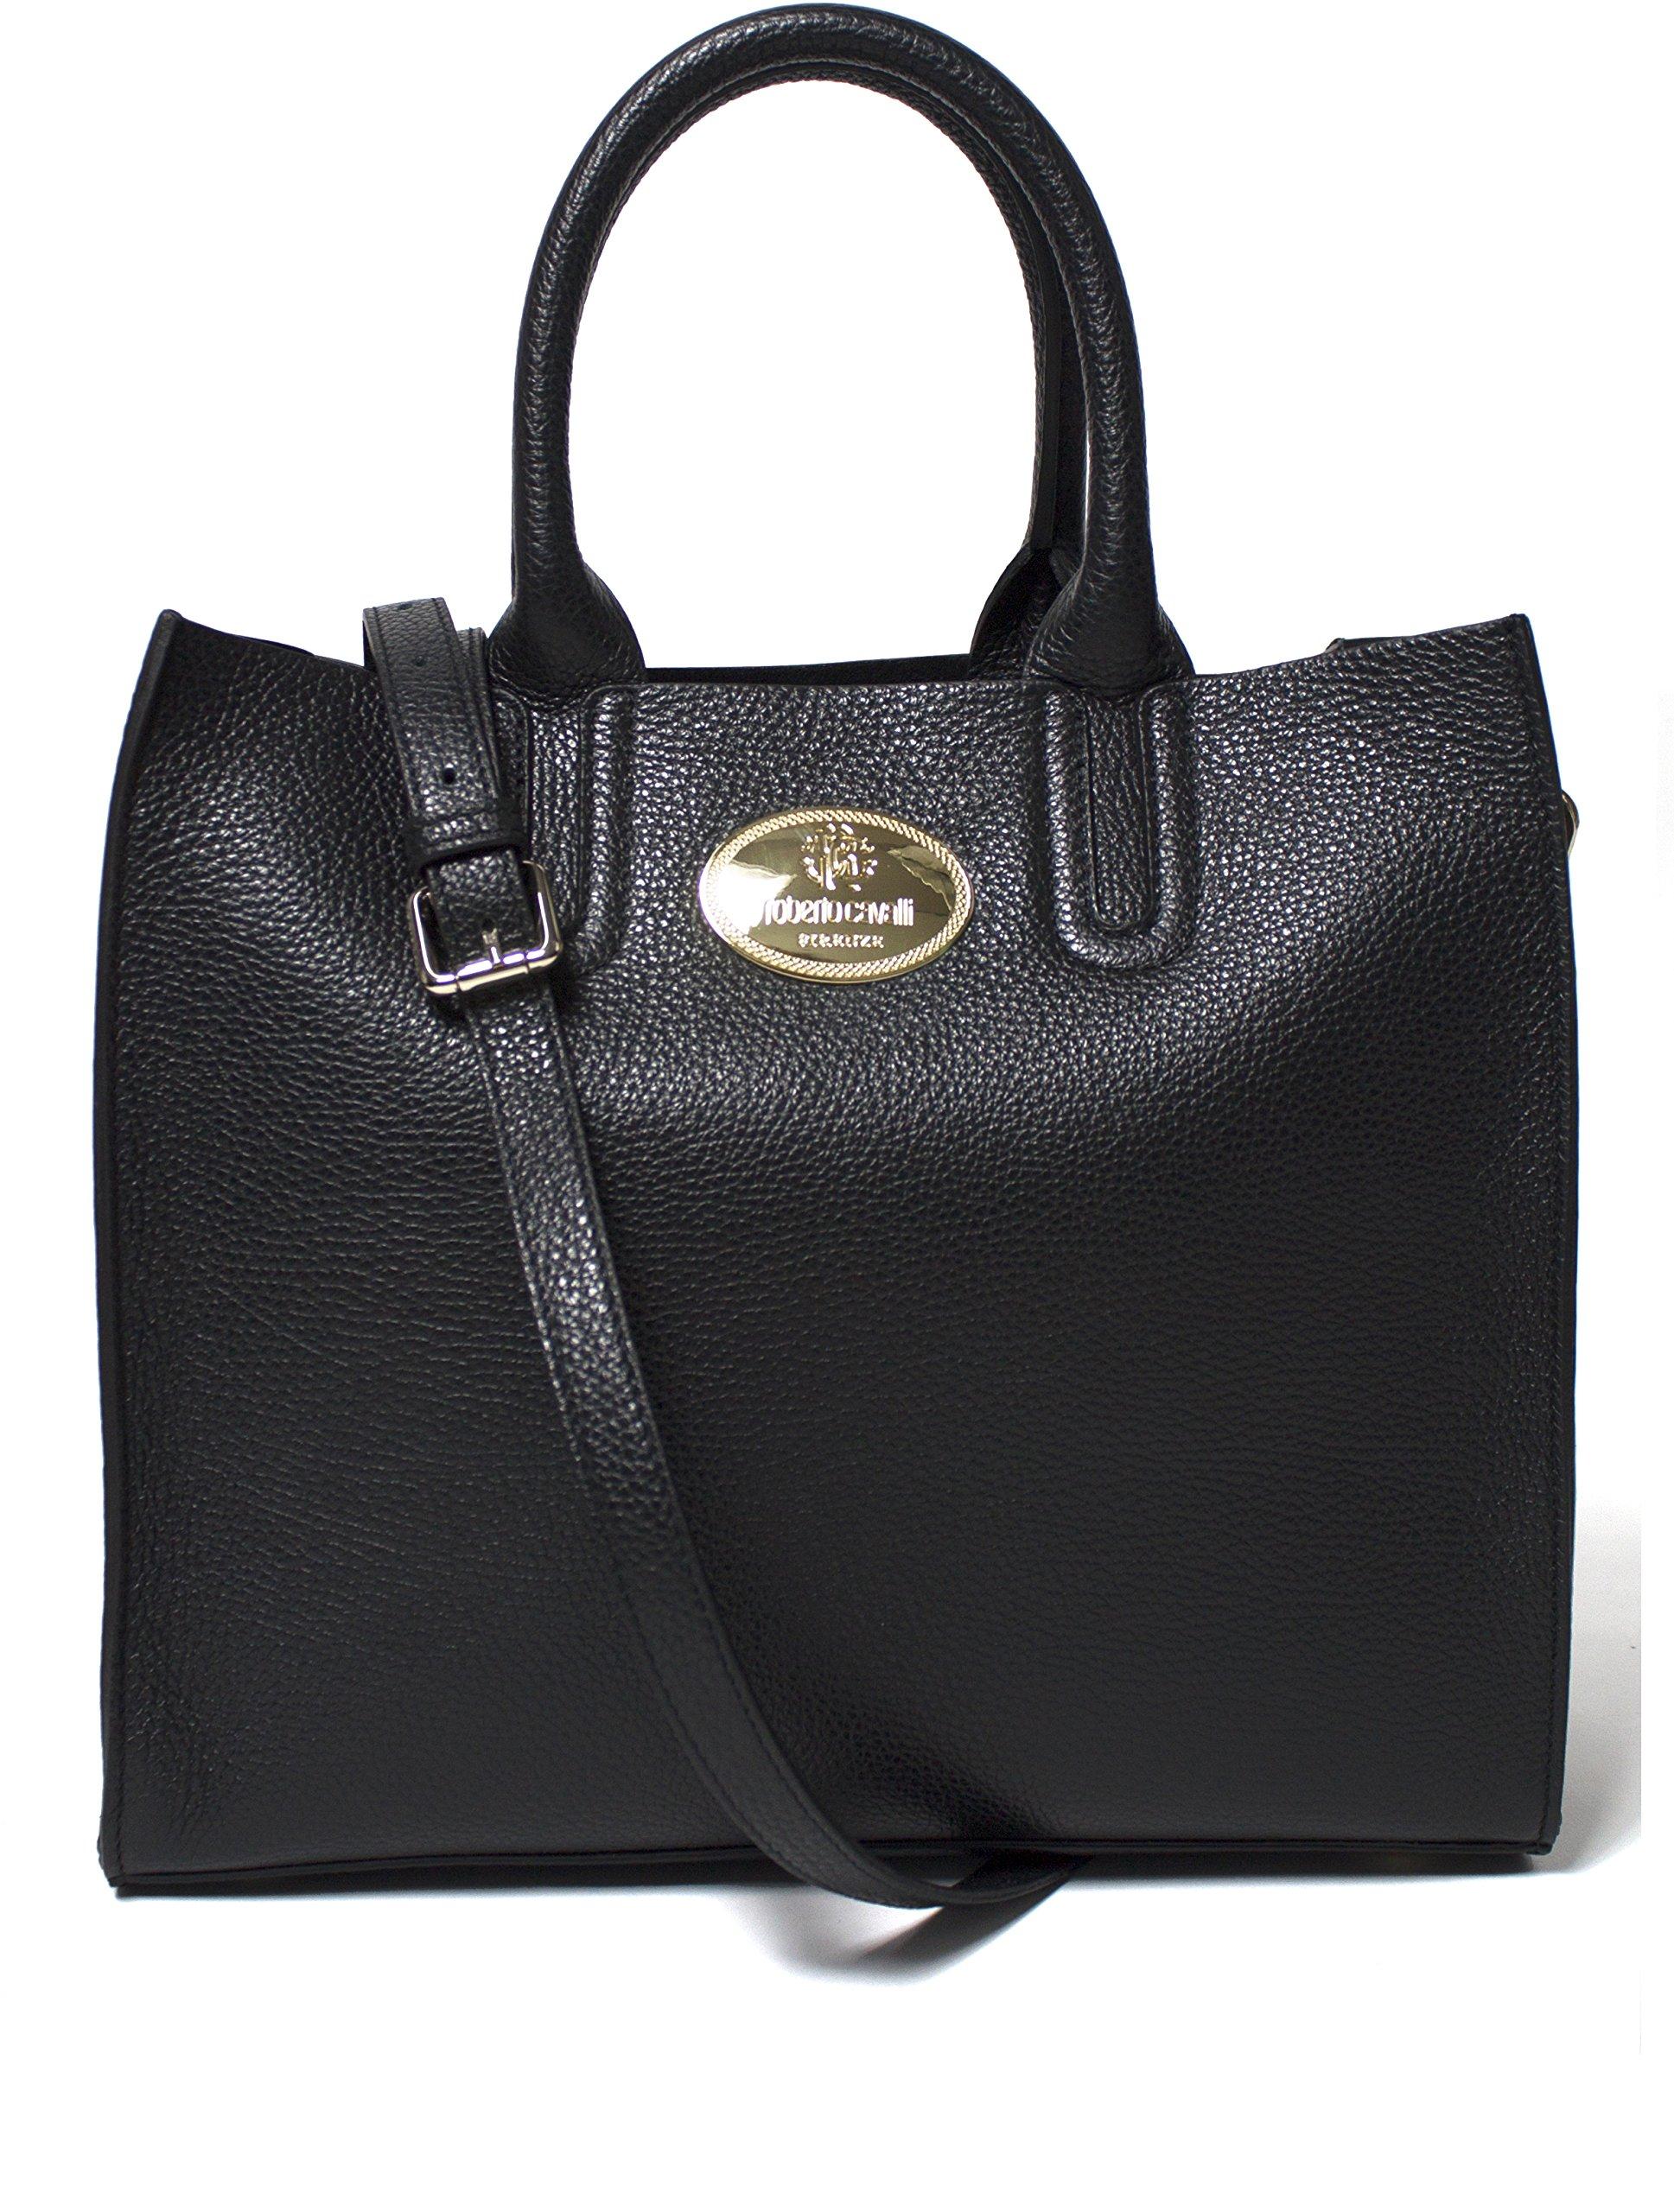 Roberto Cavalli Women's Leather Tote Handbag Black by Roberto Cavalli